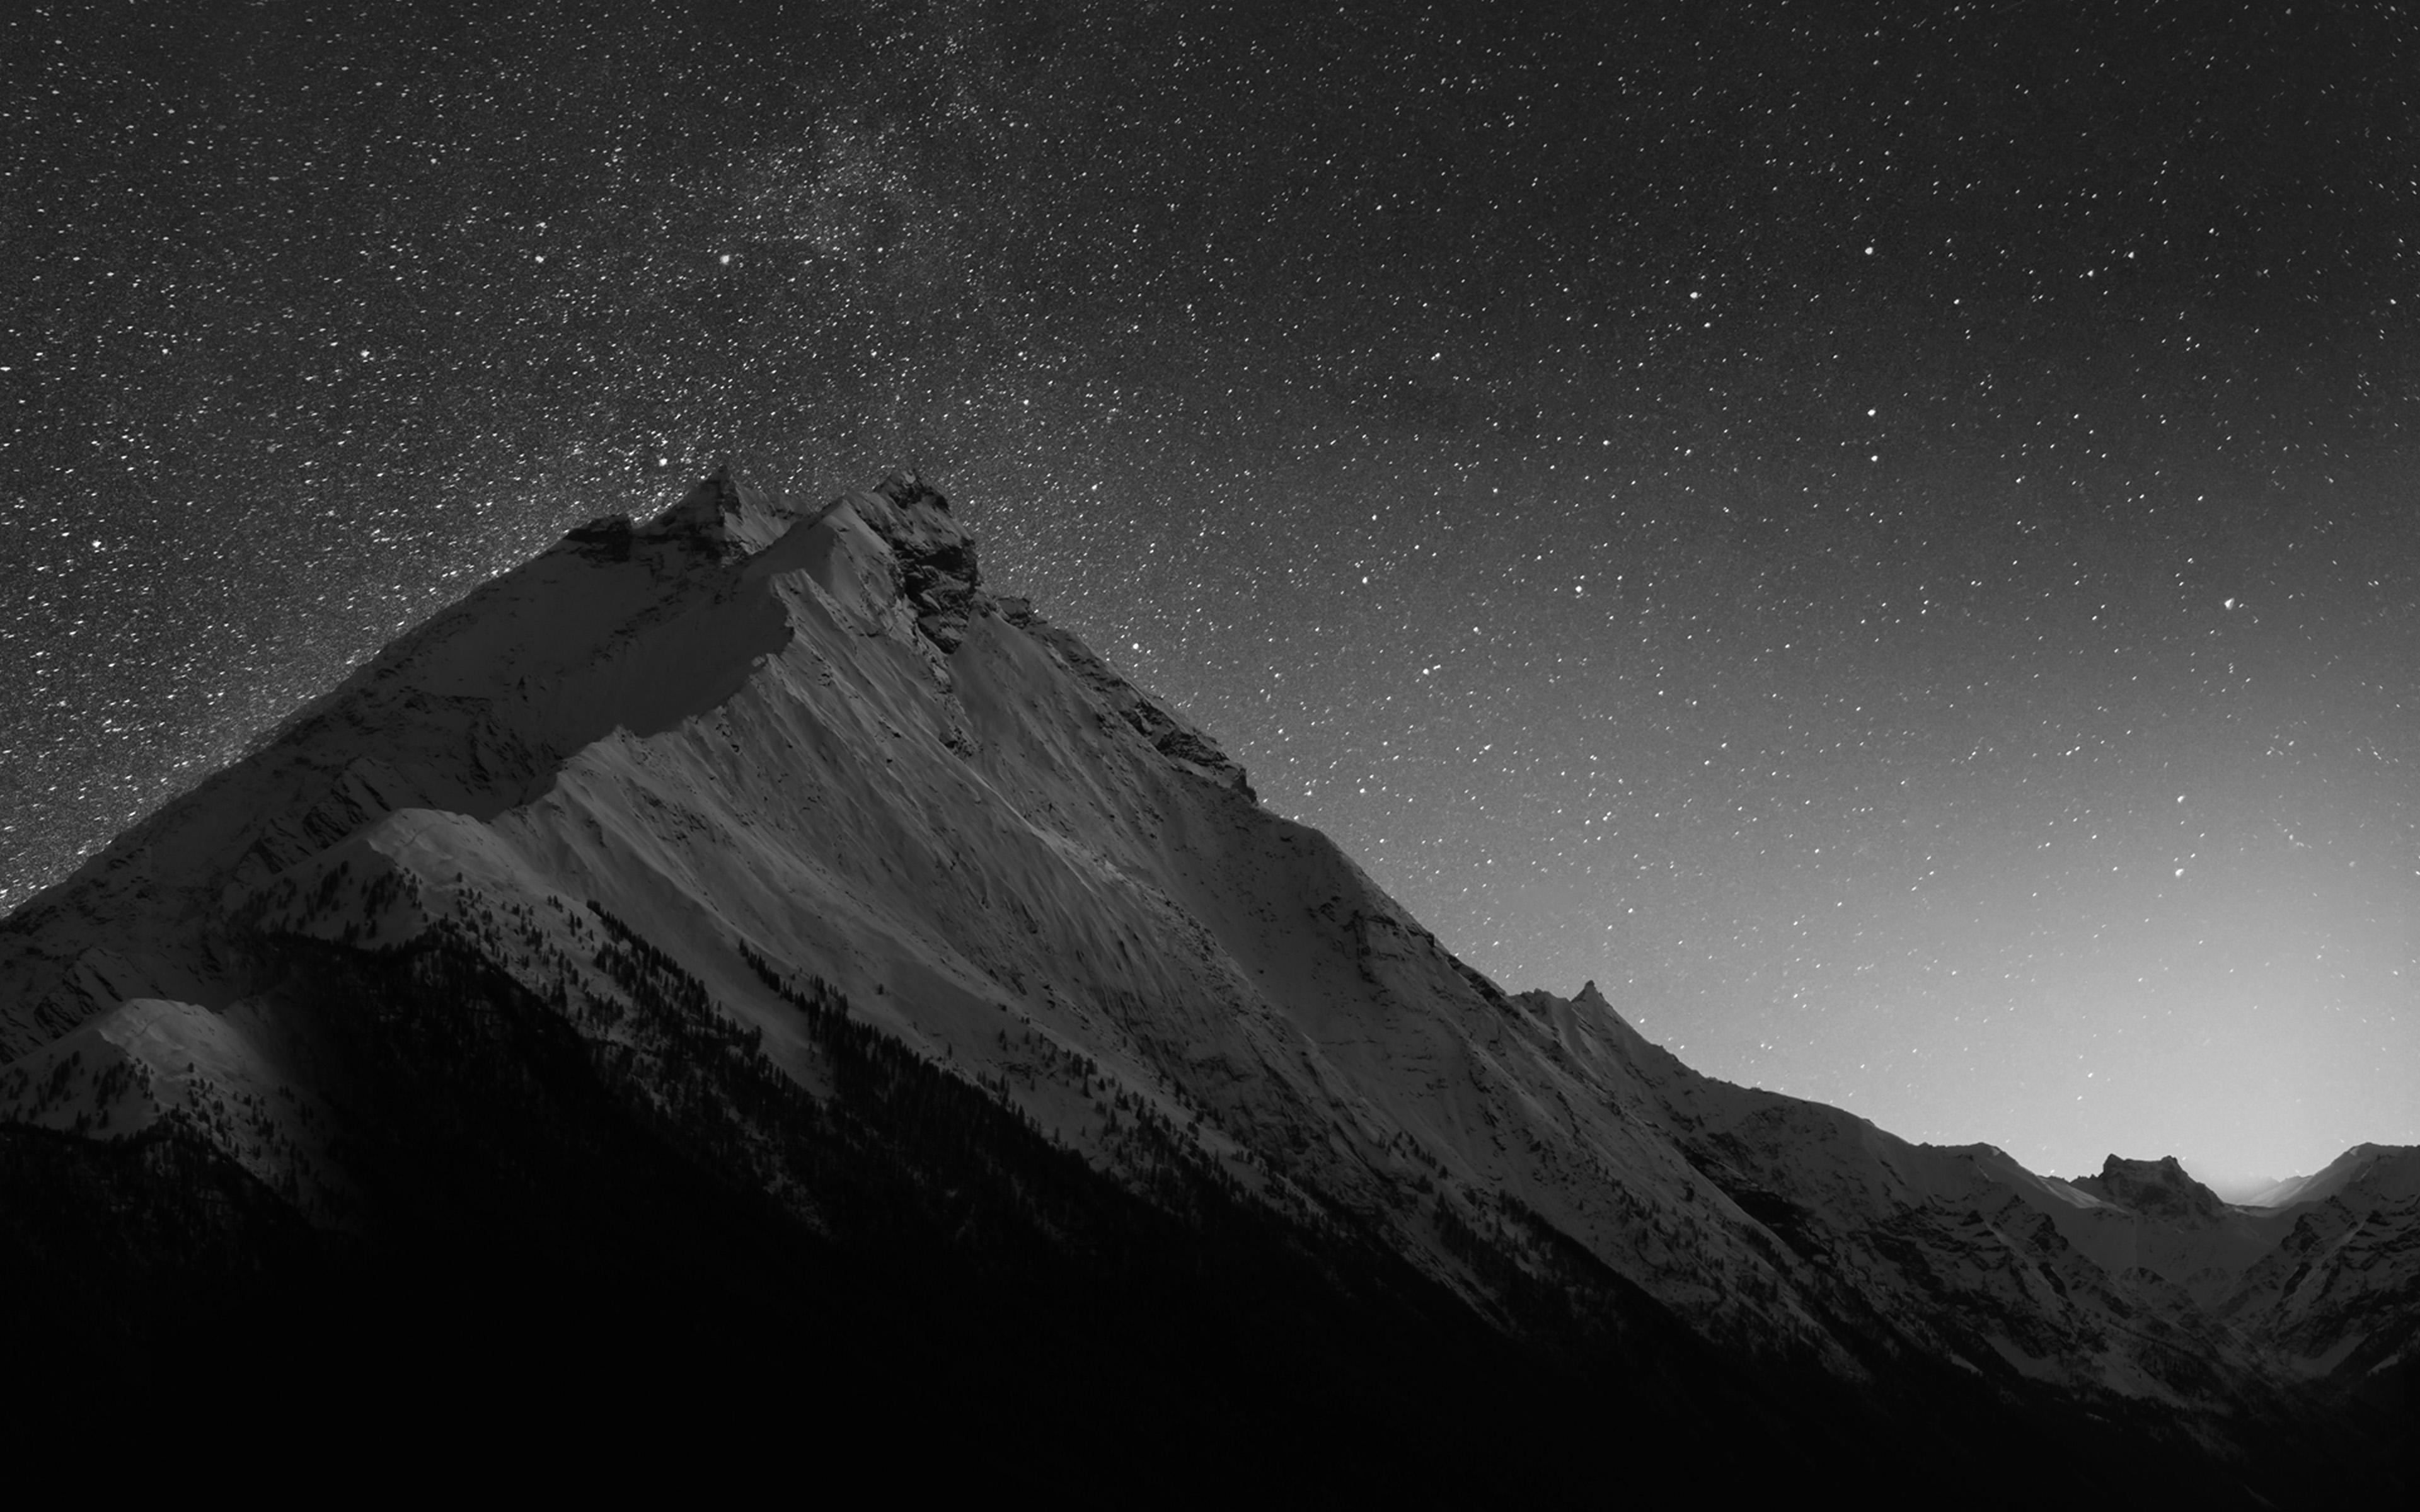 Mt90 Mountain Night Snow Dark Star Bw Wallpaper